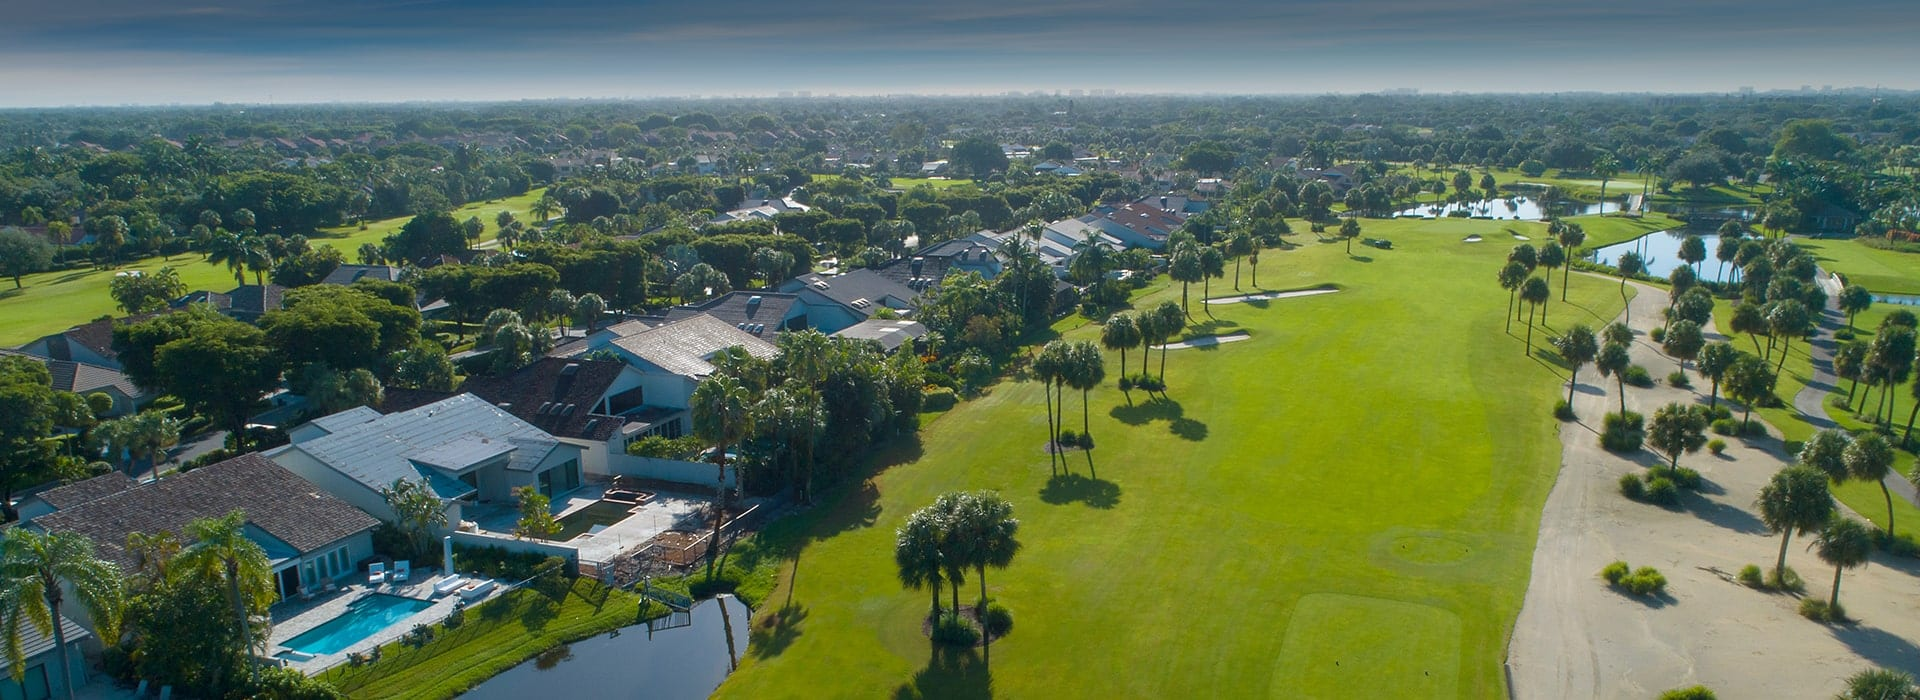 Boca West Wedgewood Neighborhood alongside golf fairway